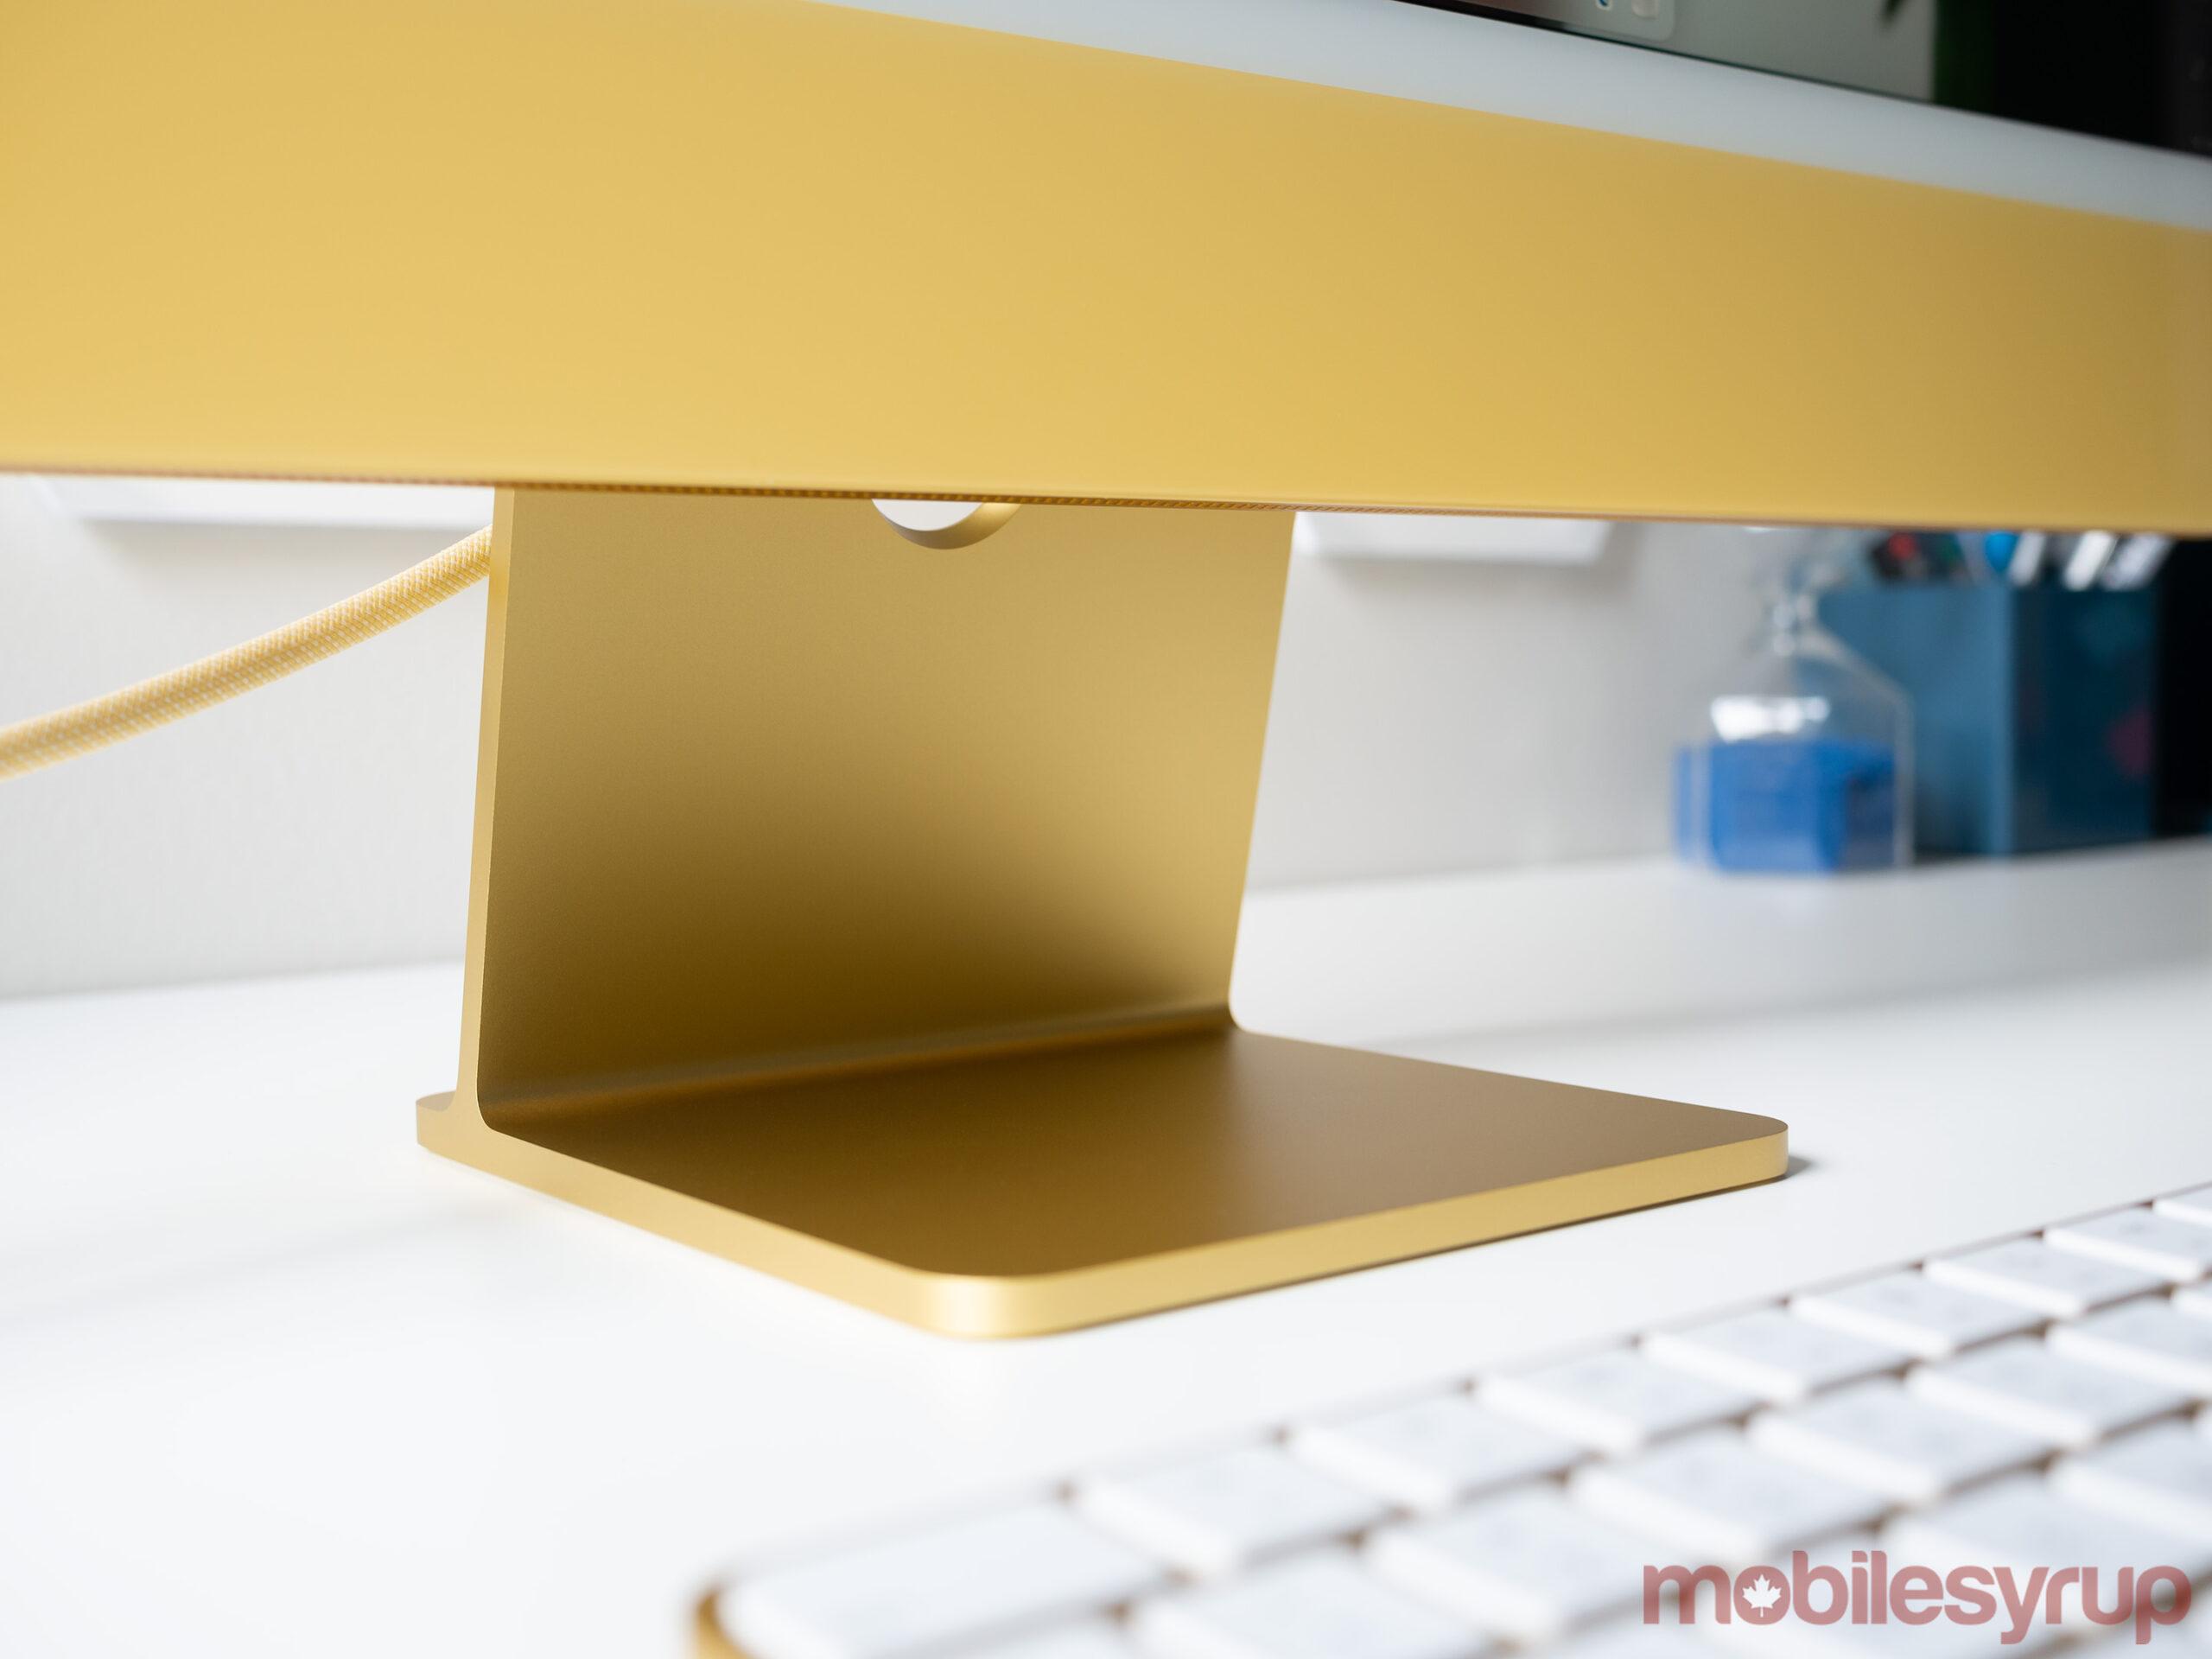 24-inch iMac 2021 stand